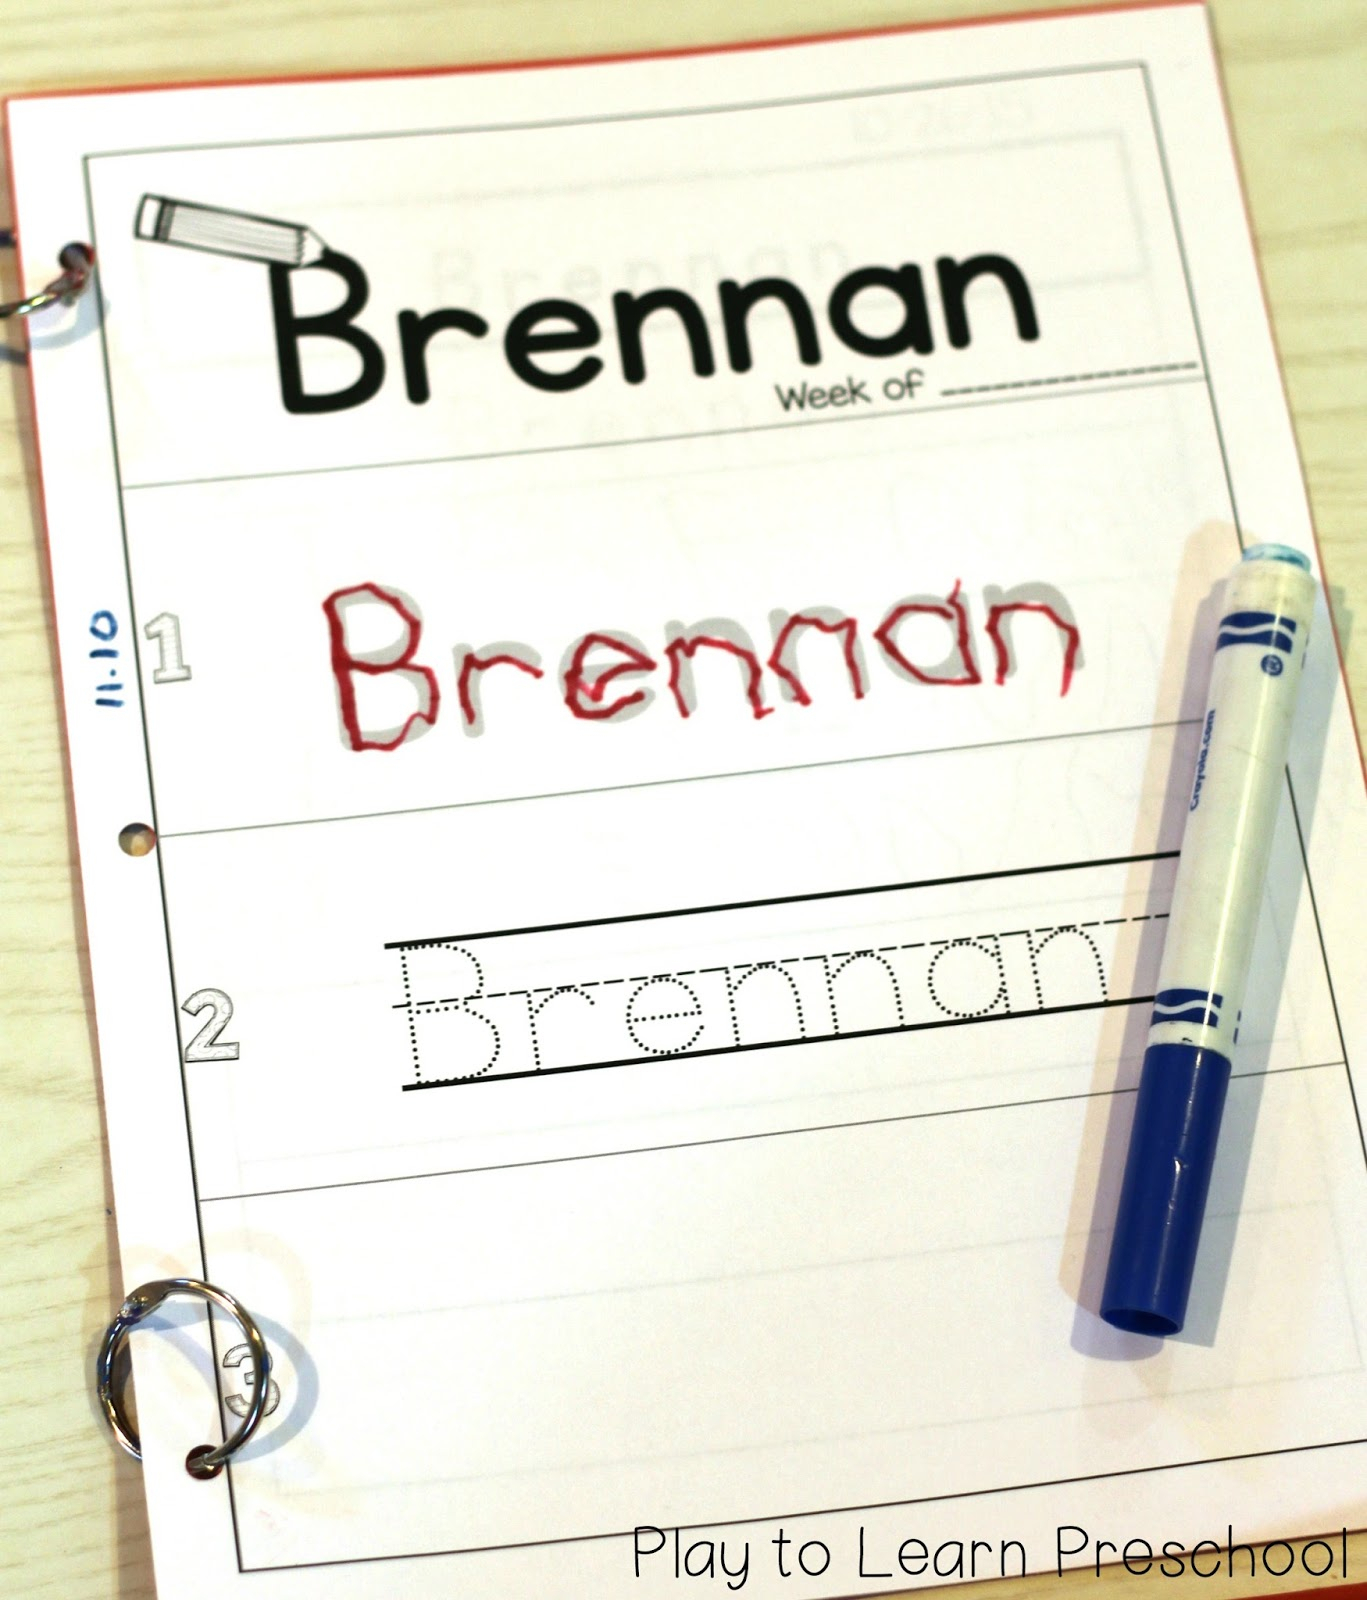 Easy Name Practice in Name Tracing Beginner